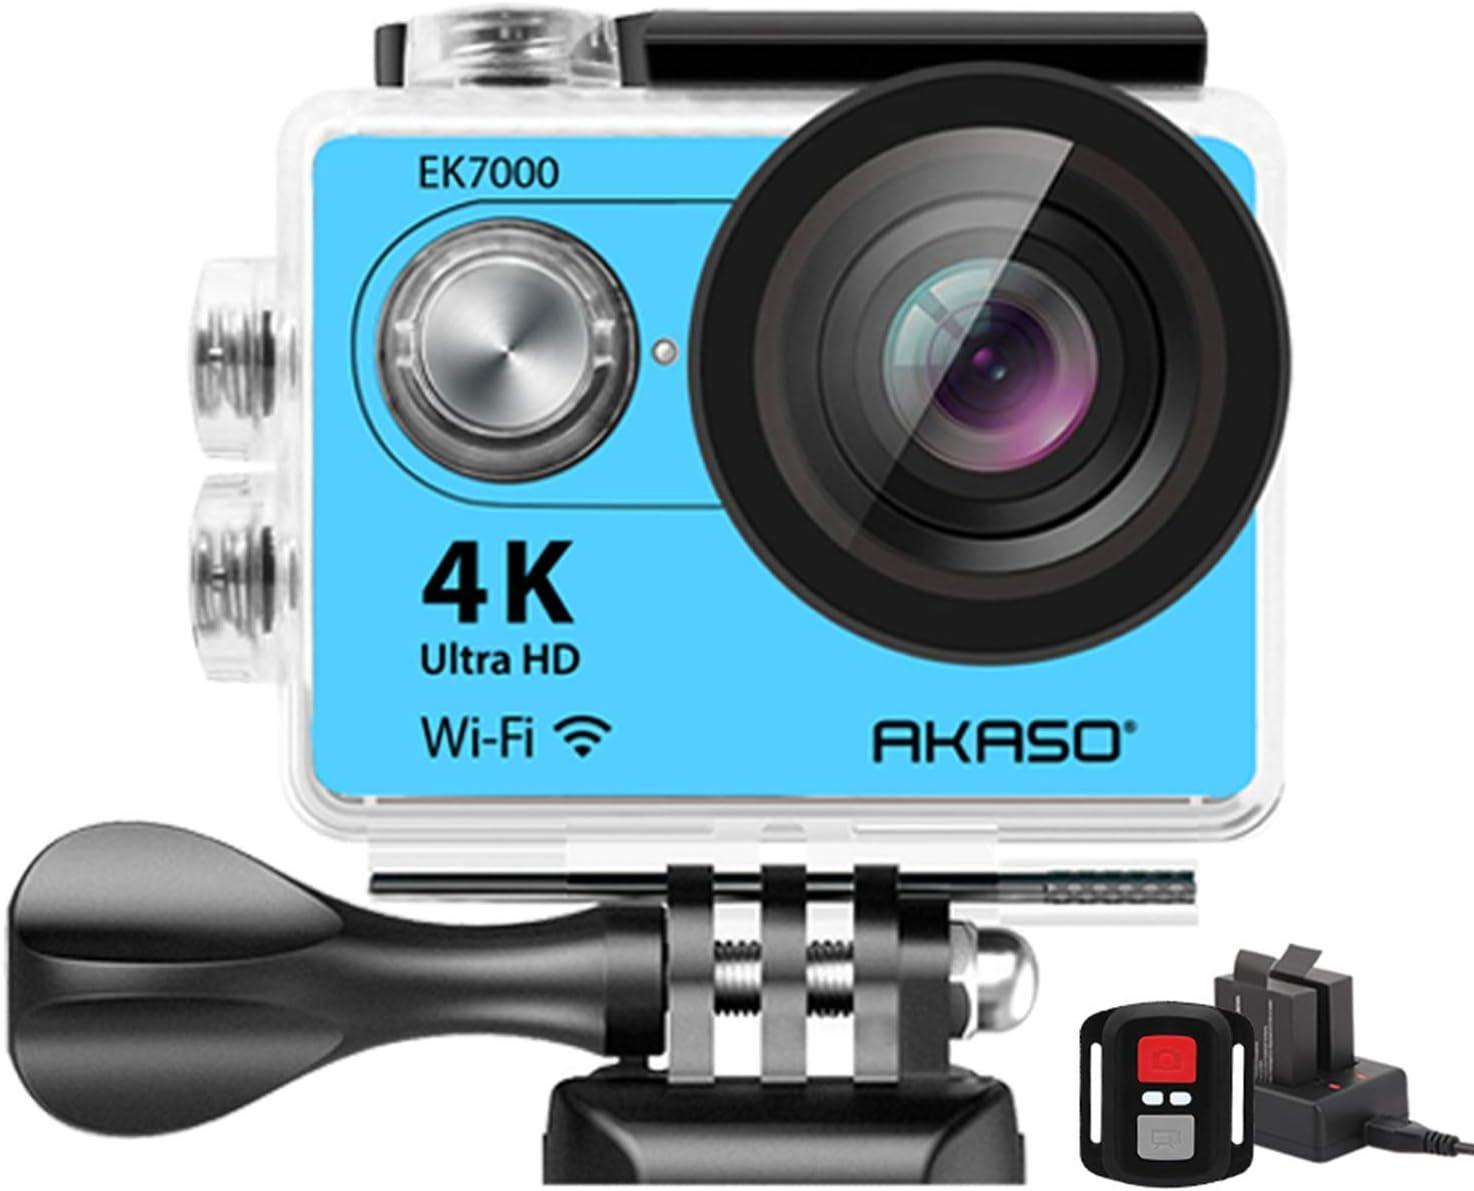 AKASO 4K Wi-Fi Sports Action Camera Ultra HD Waterproof DV Camcorder 12MP 170 Degree Wide Angle LCD Screen/Remote, Royal Blue (EK7000BL) : Electronics